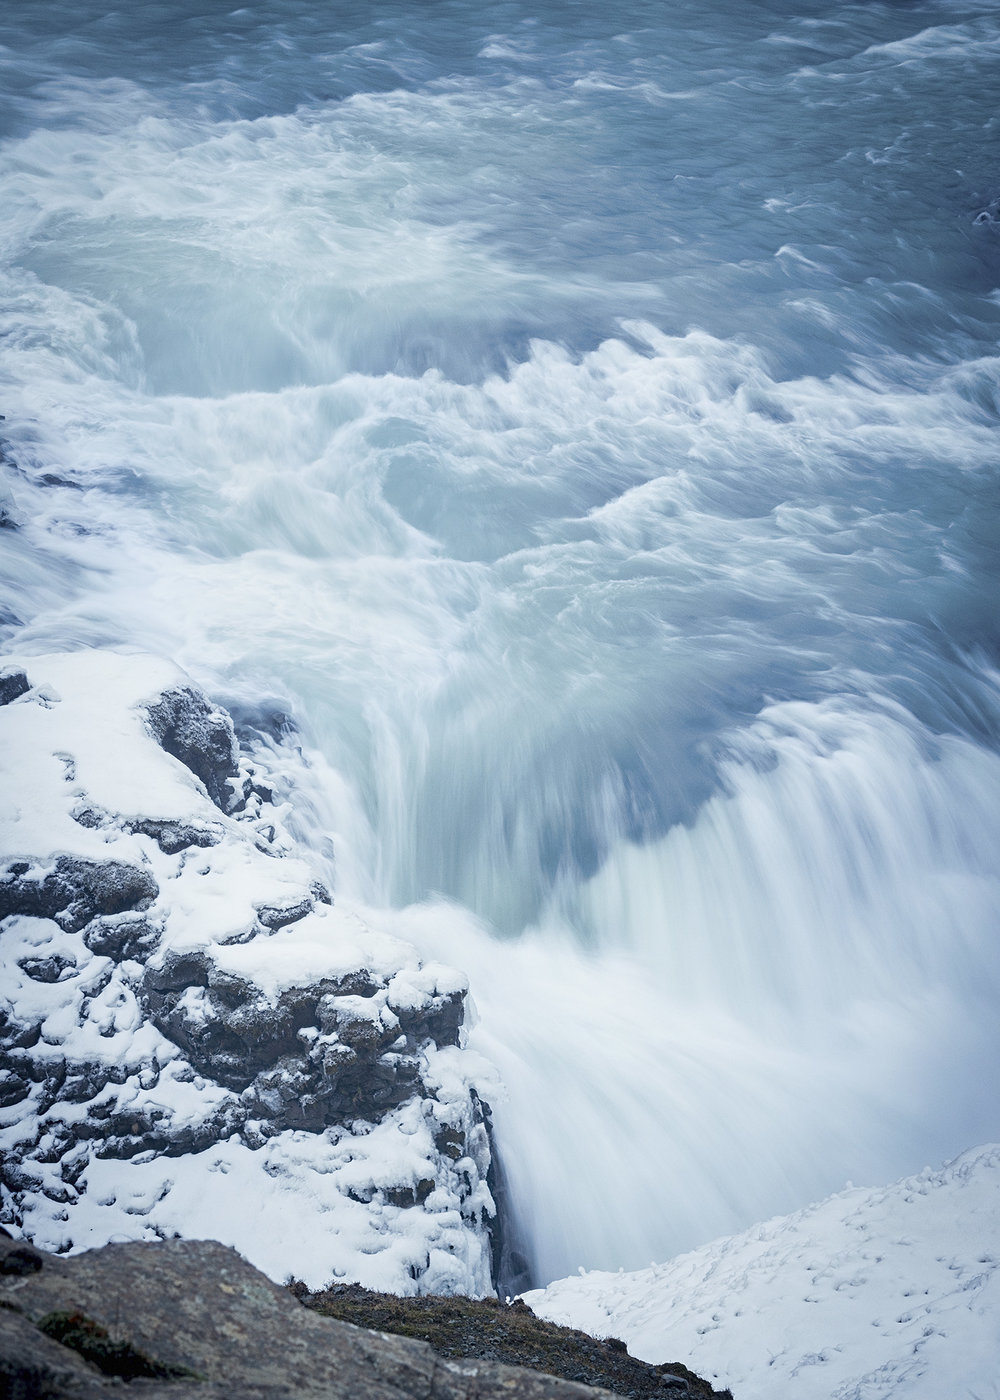 05_02_SOUTH_EAST_ICELAND_0203.jpg